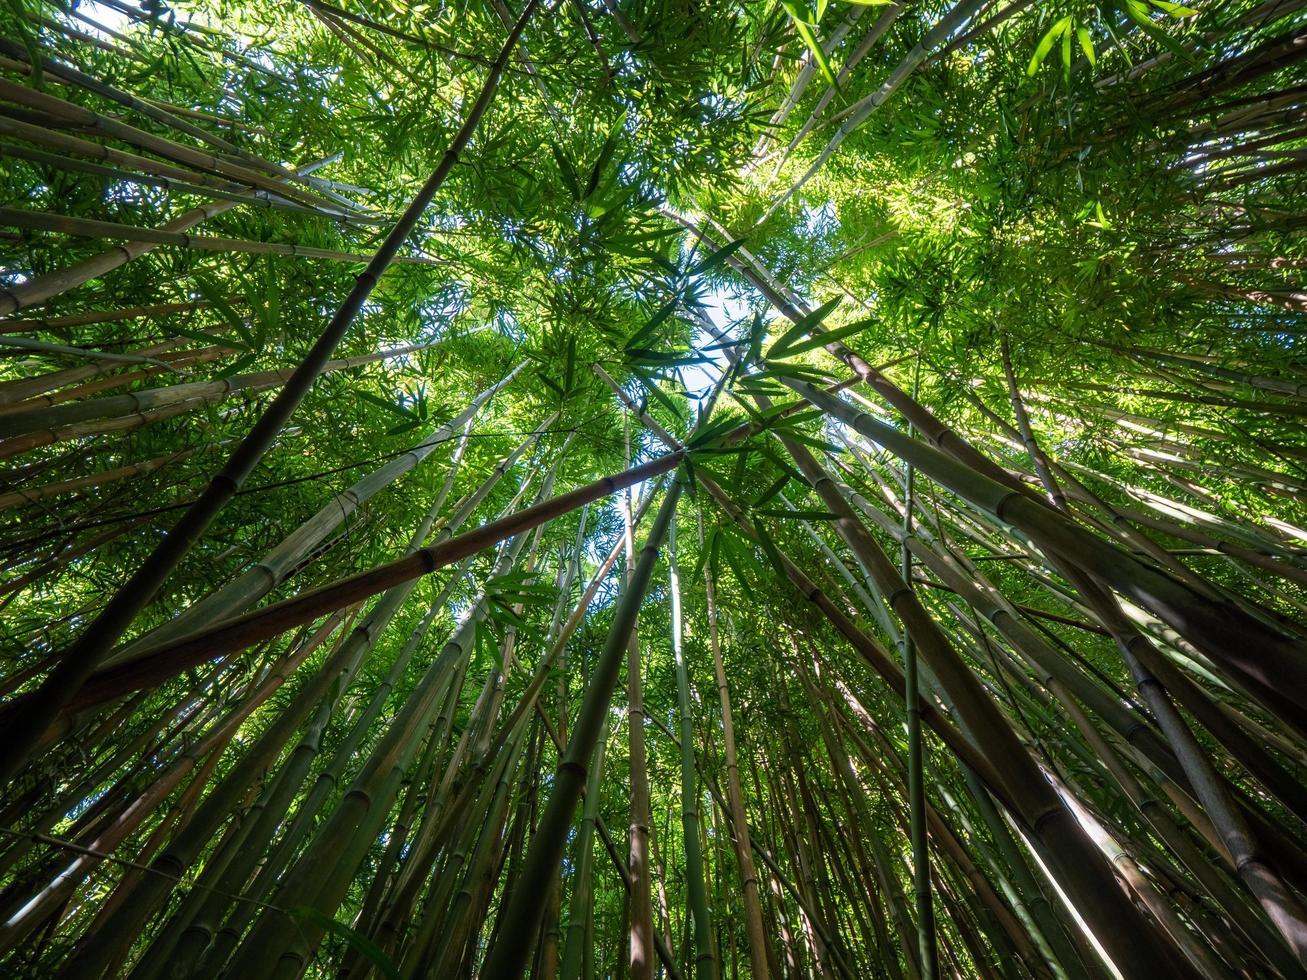 Looking up at bamboo and sky photo